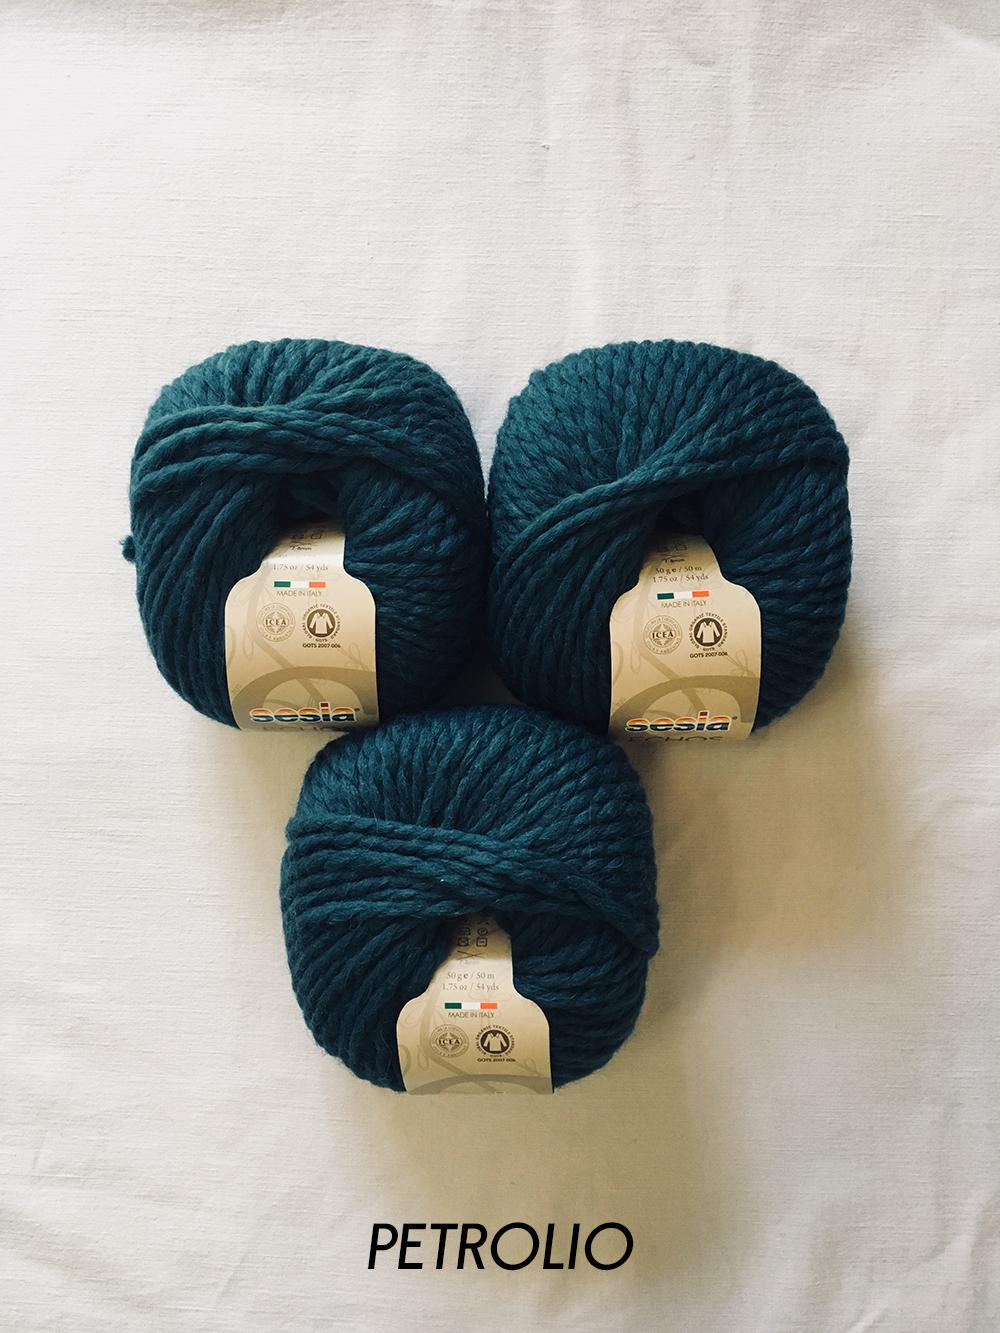 sesia_echos_petrolio_2993_wool_done_knitting.jpg